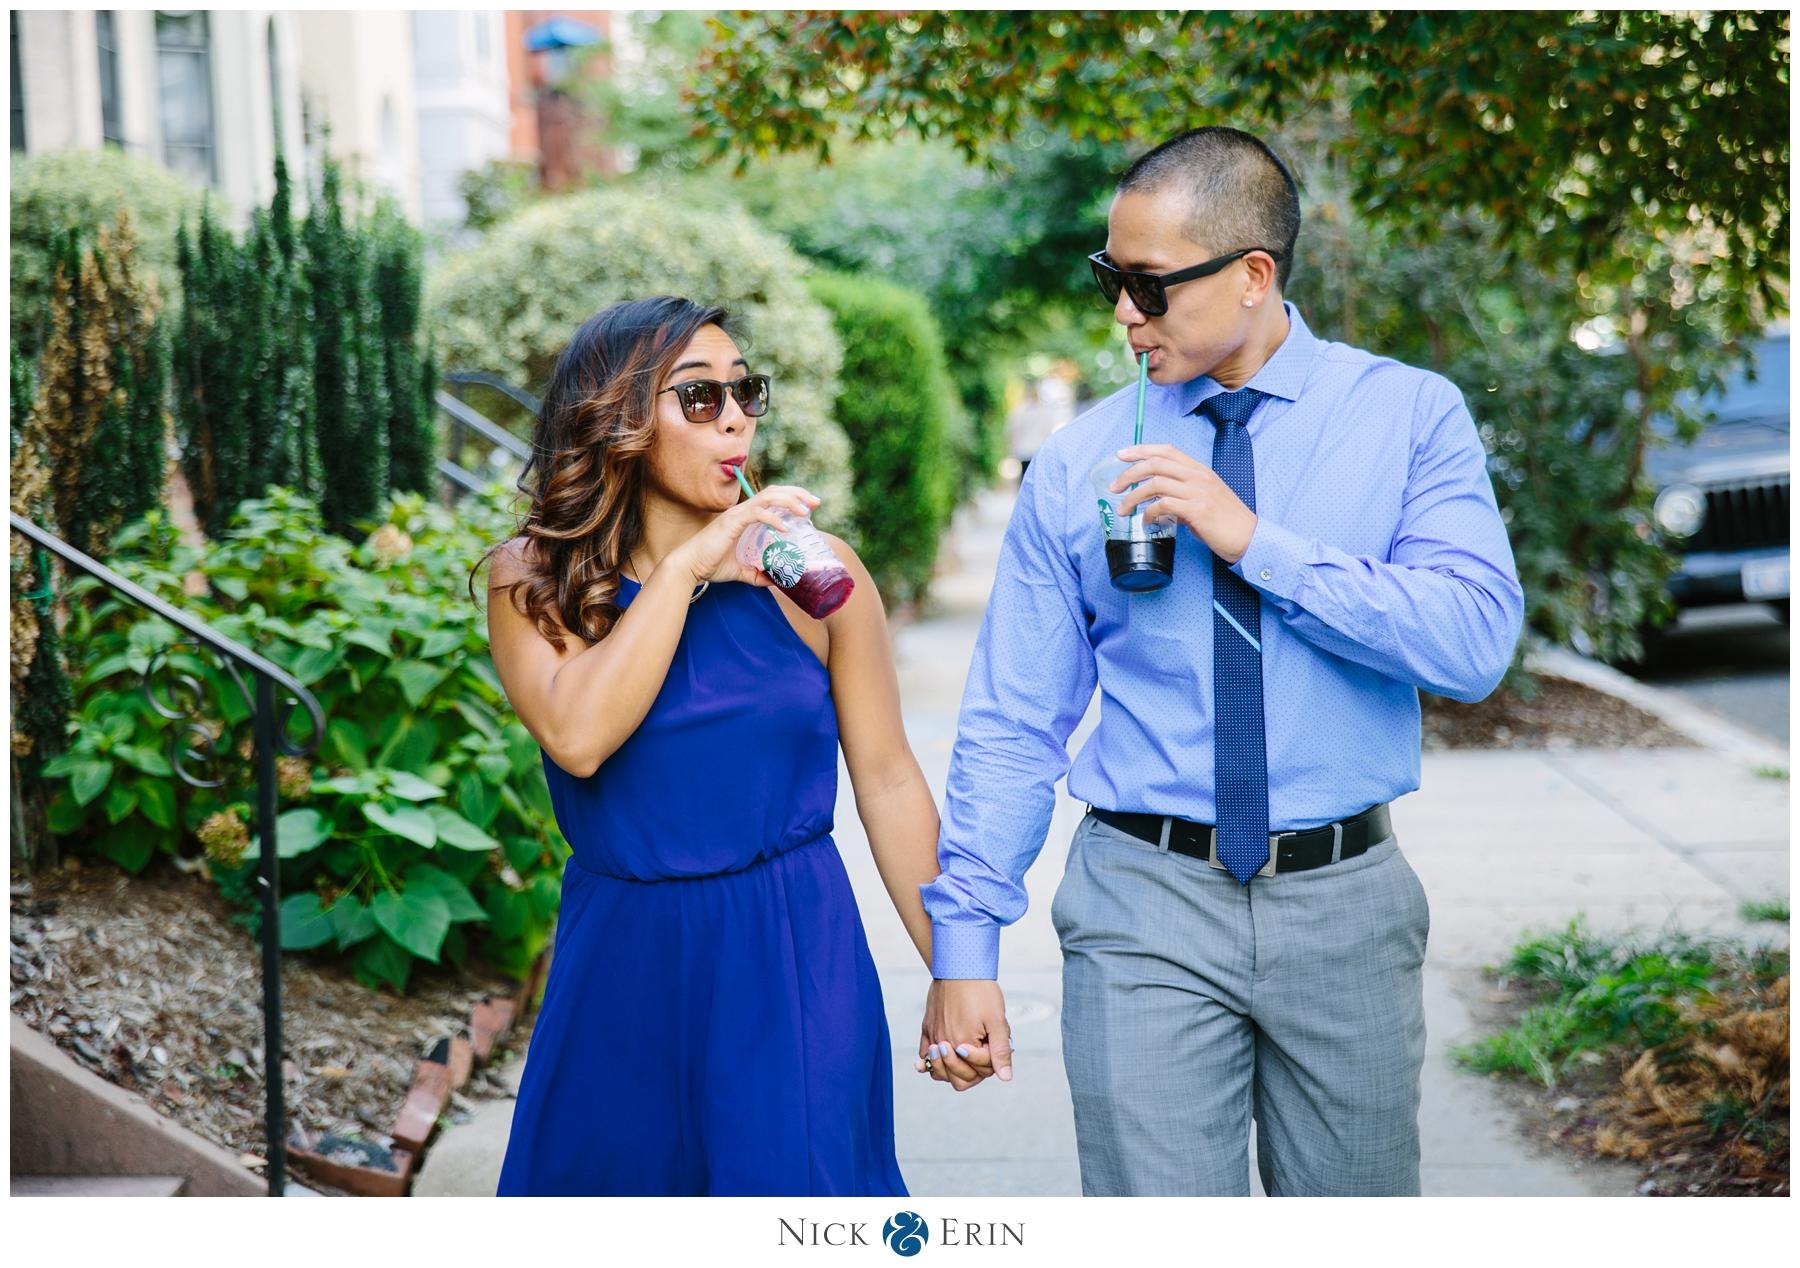 Donner_Photography_Washington DC Engagement Session_Jenny Mae & Vic_0019